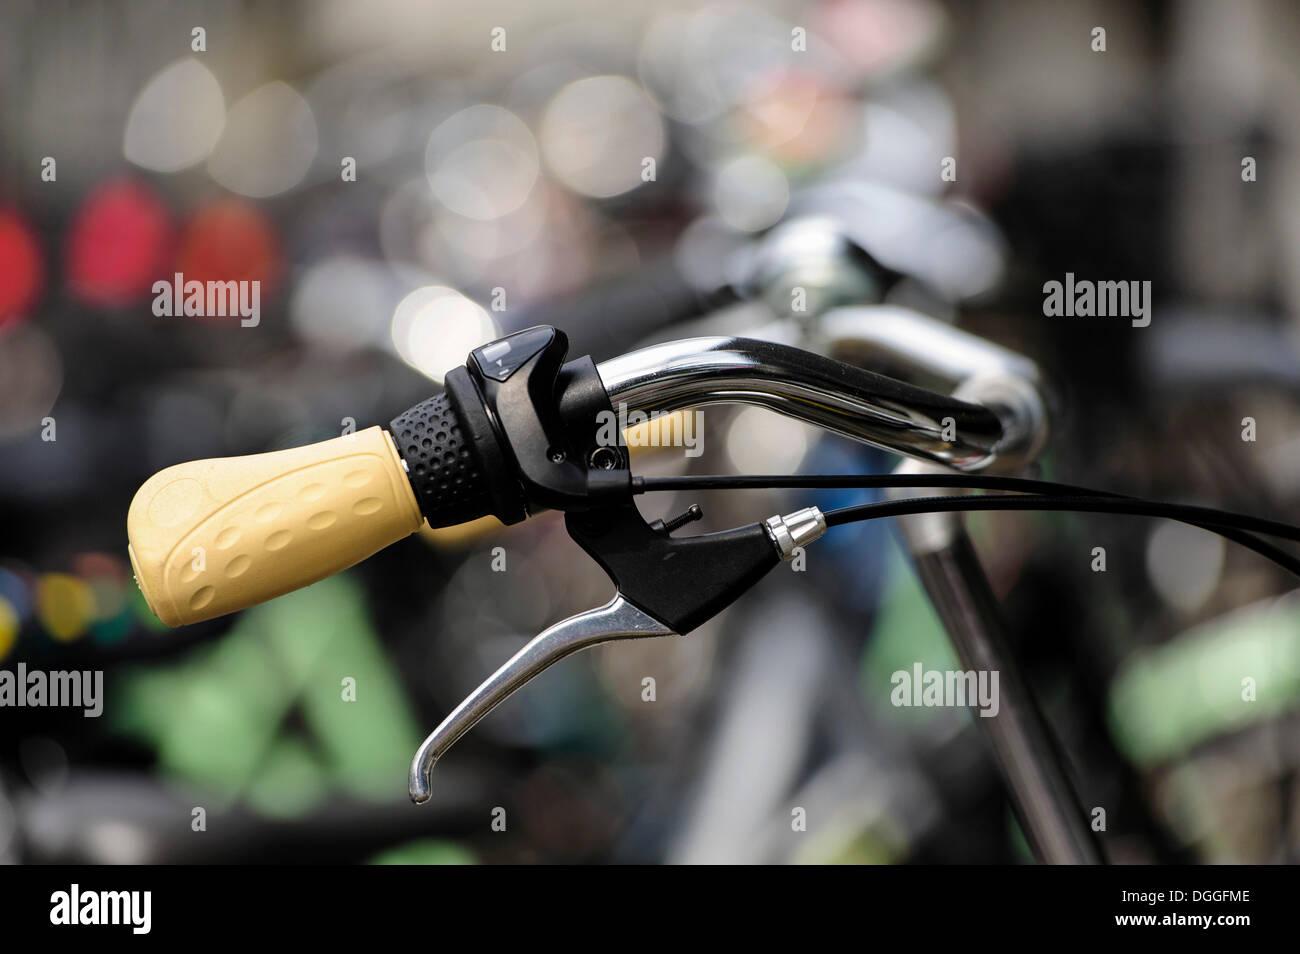 Bicycle handlebars with yellow handles, Neuss, North Rhine-Westphalia, Germany - Stock Image